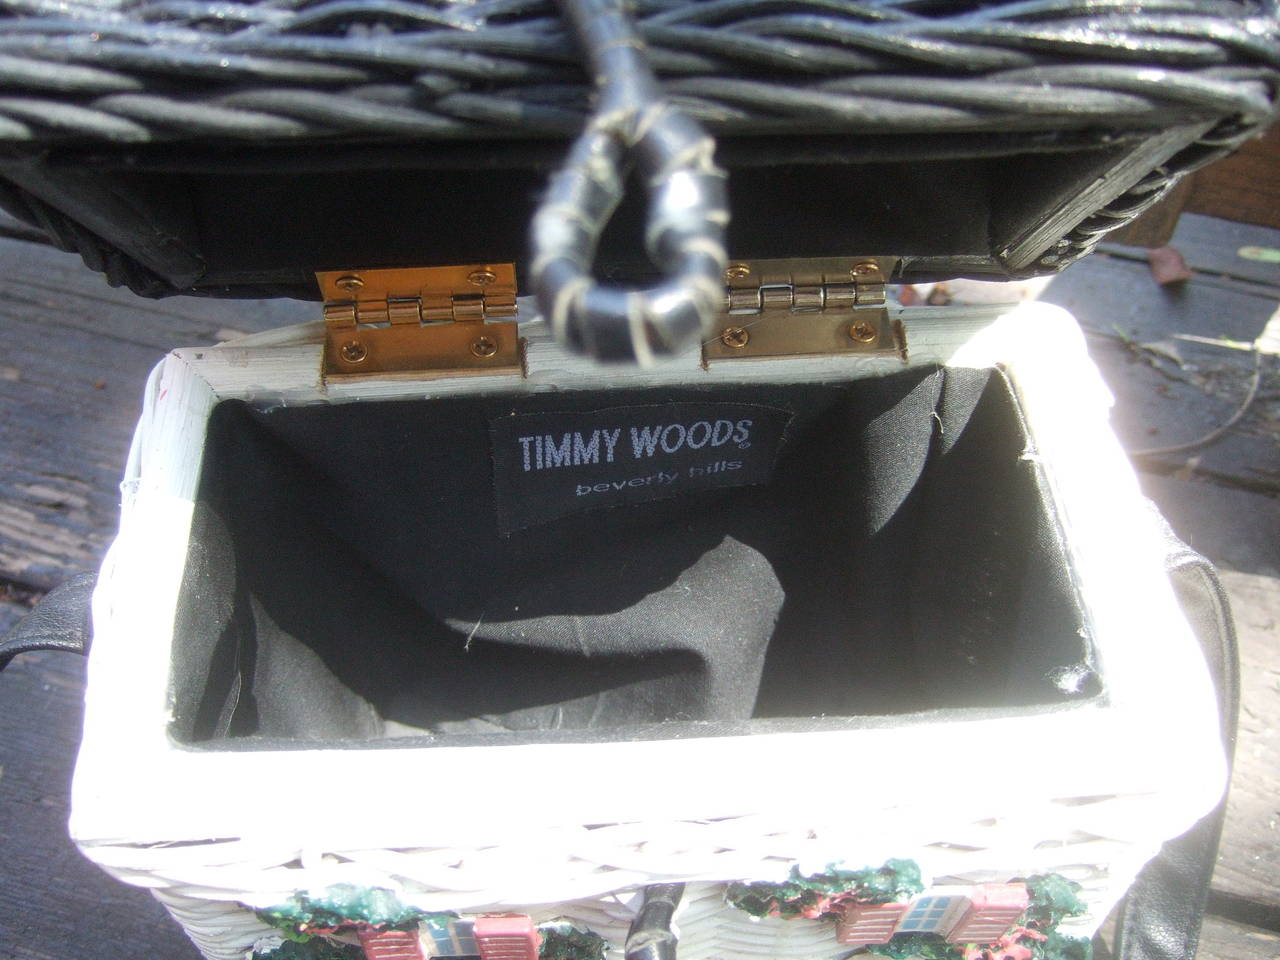 Timmy Woods Beverly Hills Whimsical Wicker House Handbag 10